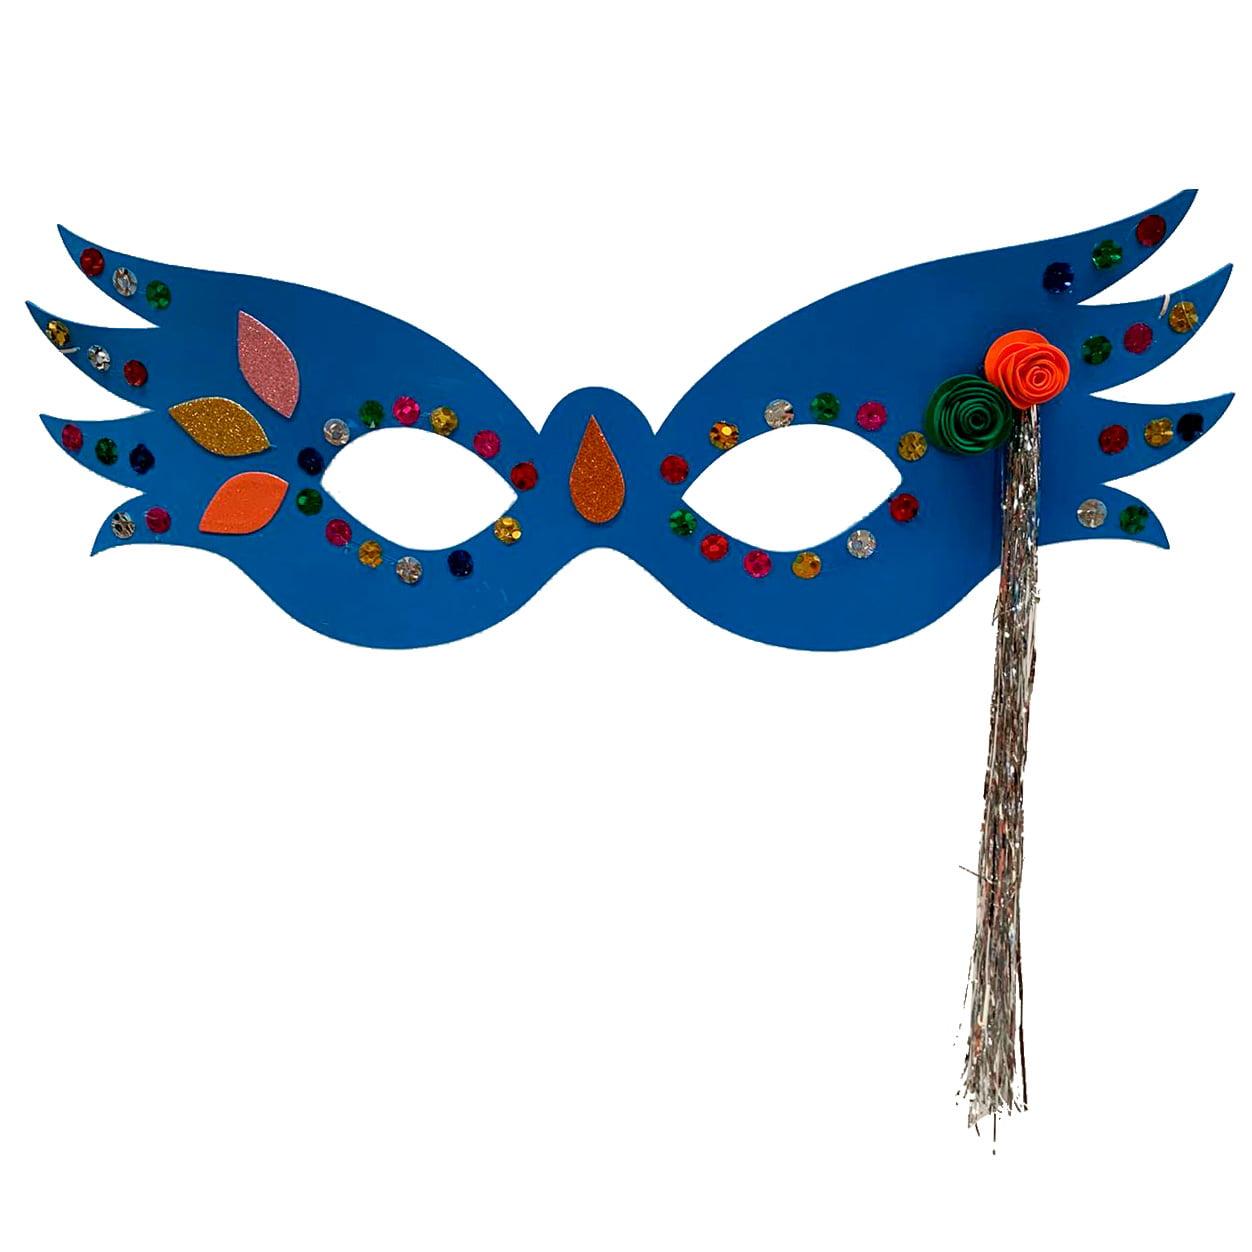 Máscara Carnaval Grande Luxo Azul